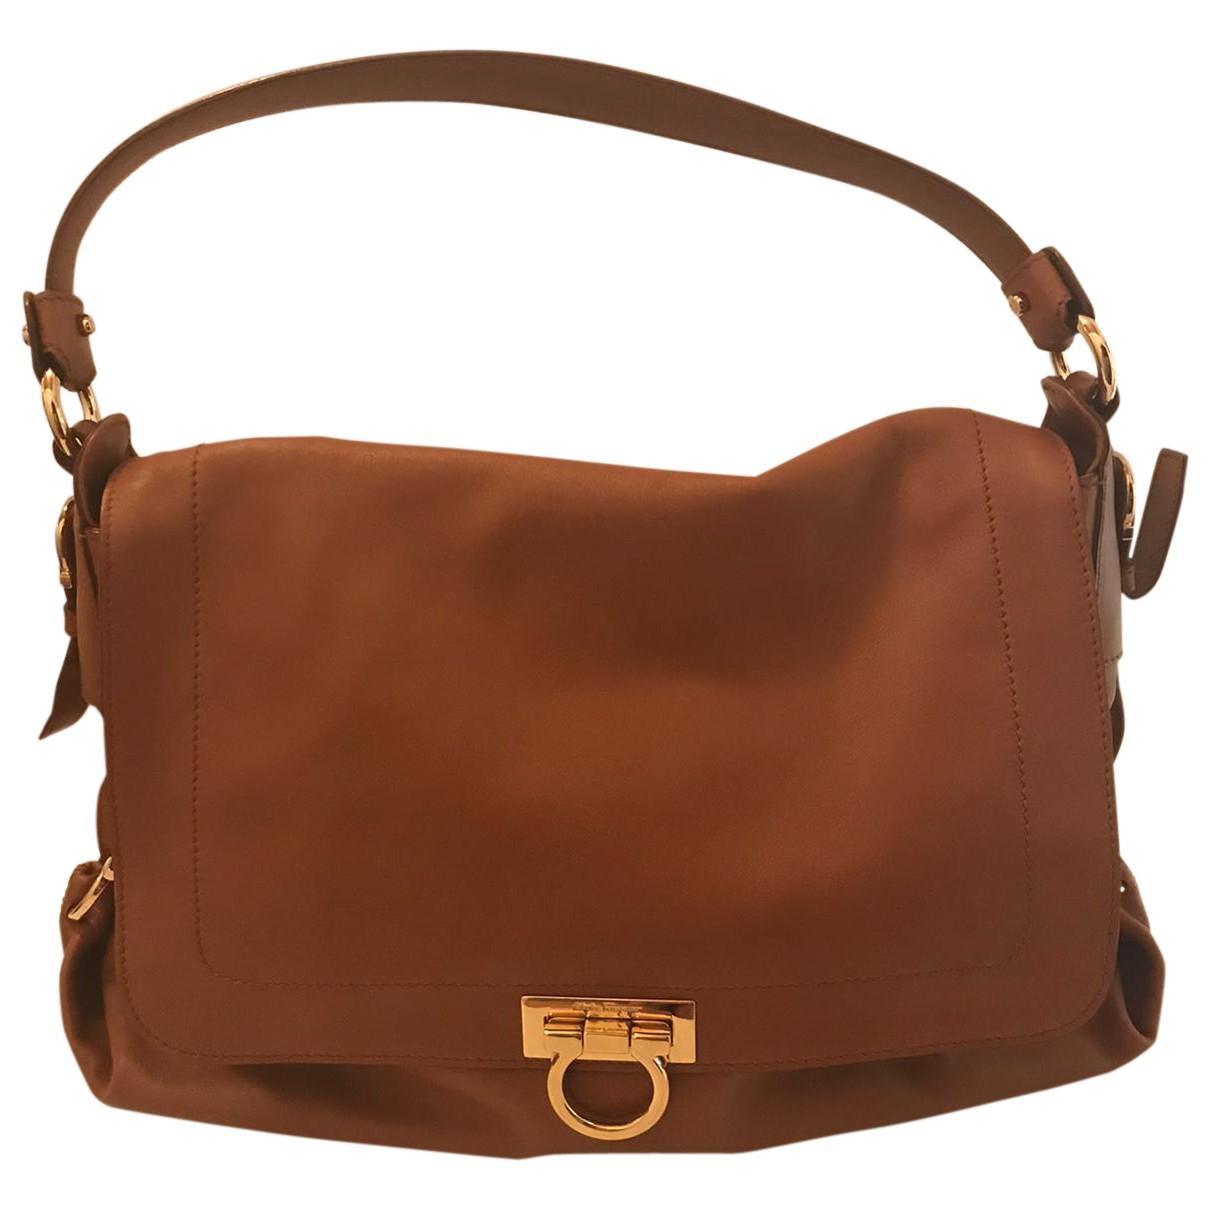 Salvatore Ferragamo \N Brown Leather handbag for Women \N